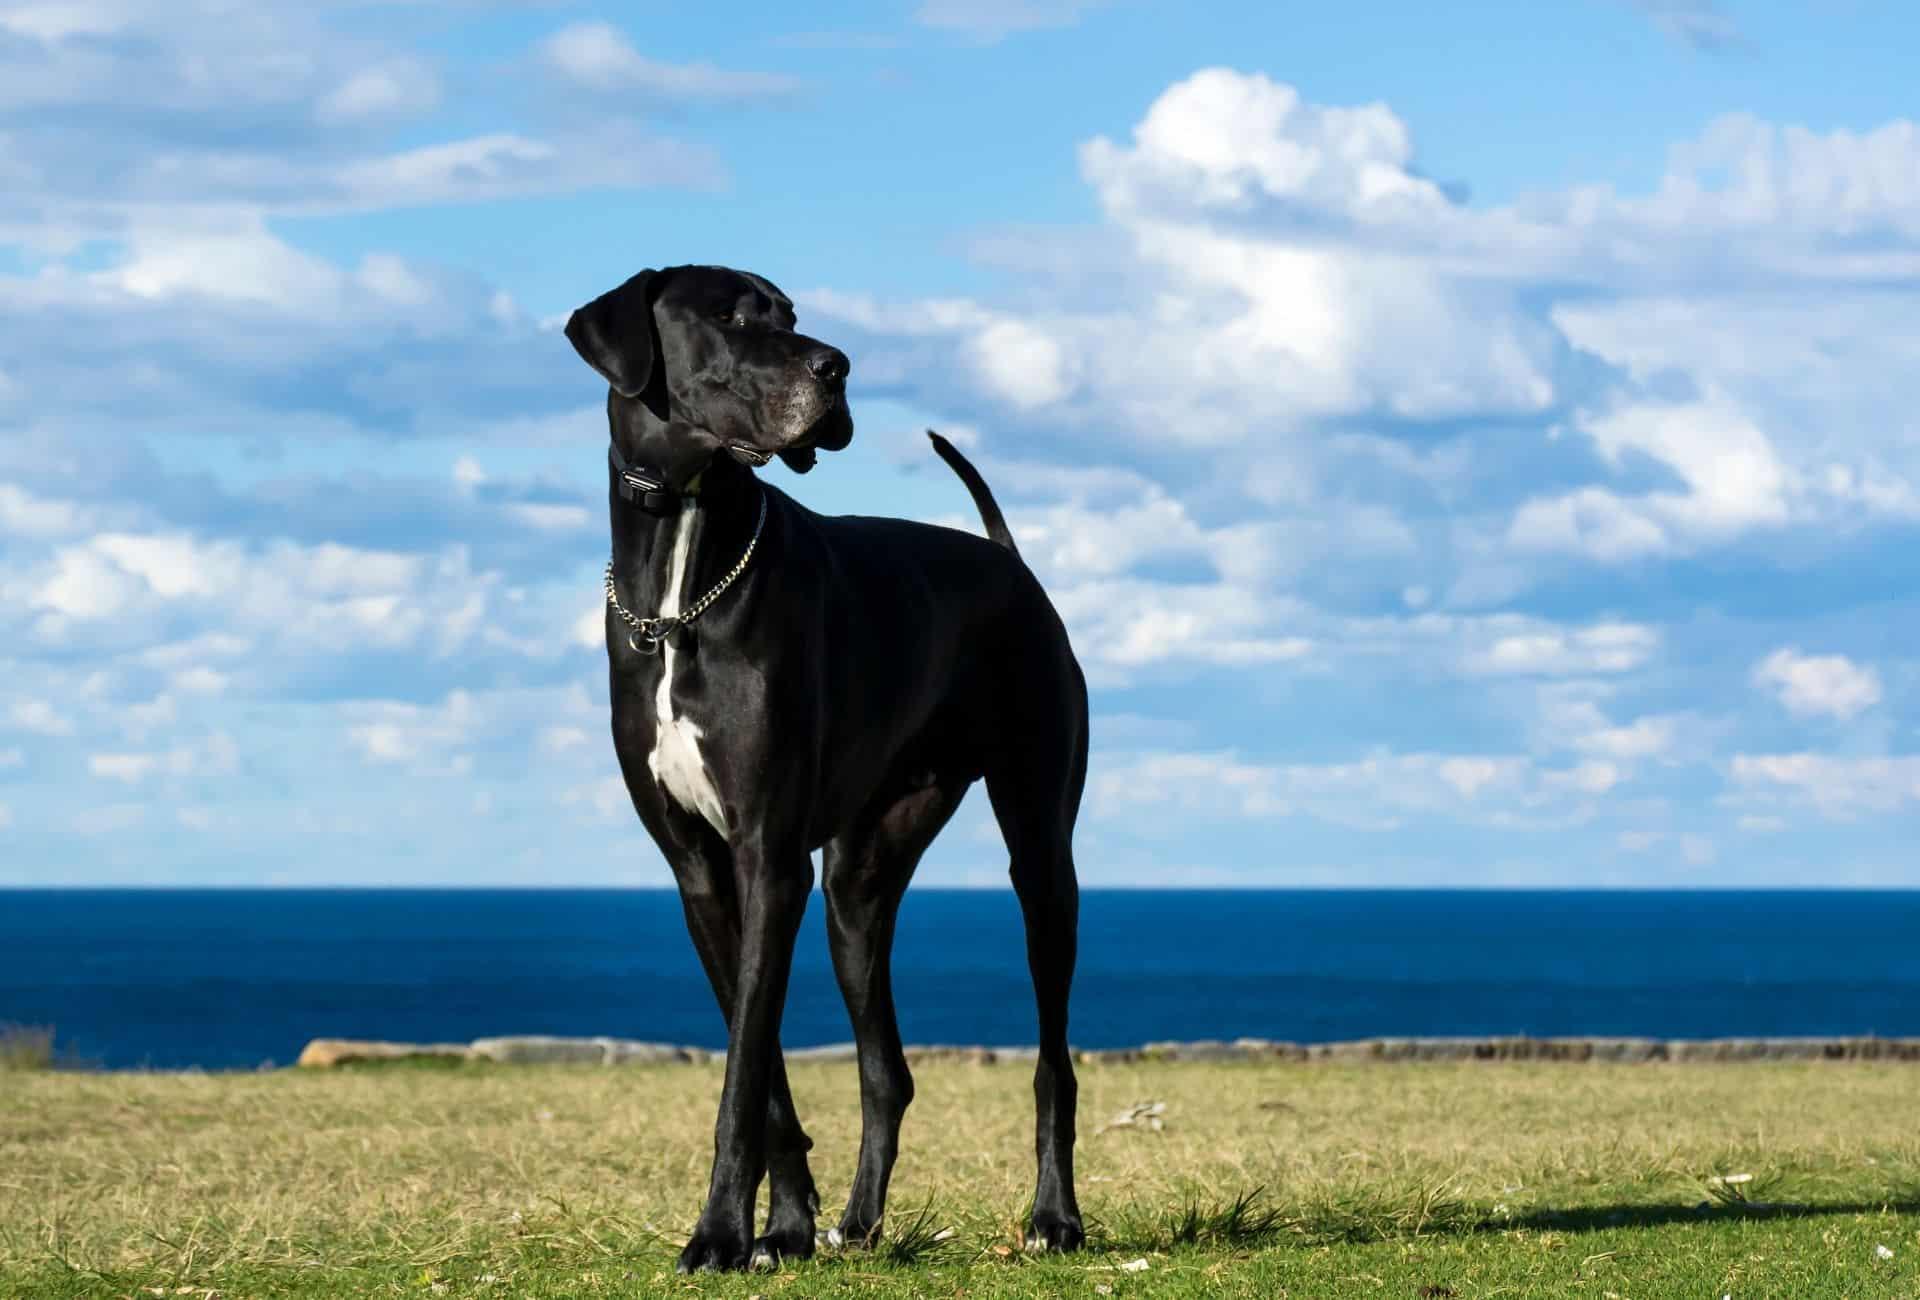 Fully grown black Great Dane.